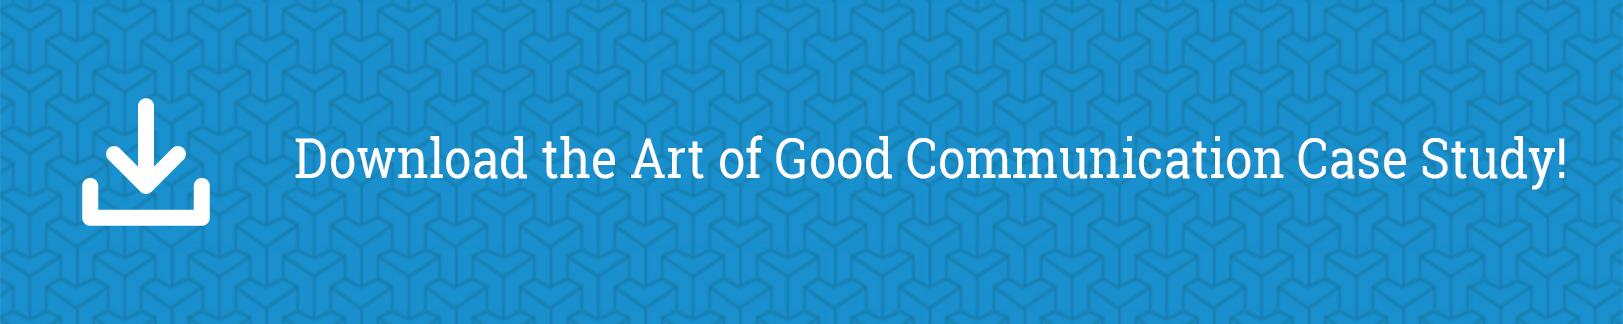 Art of good communication